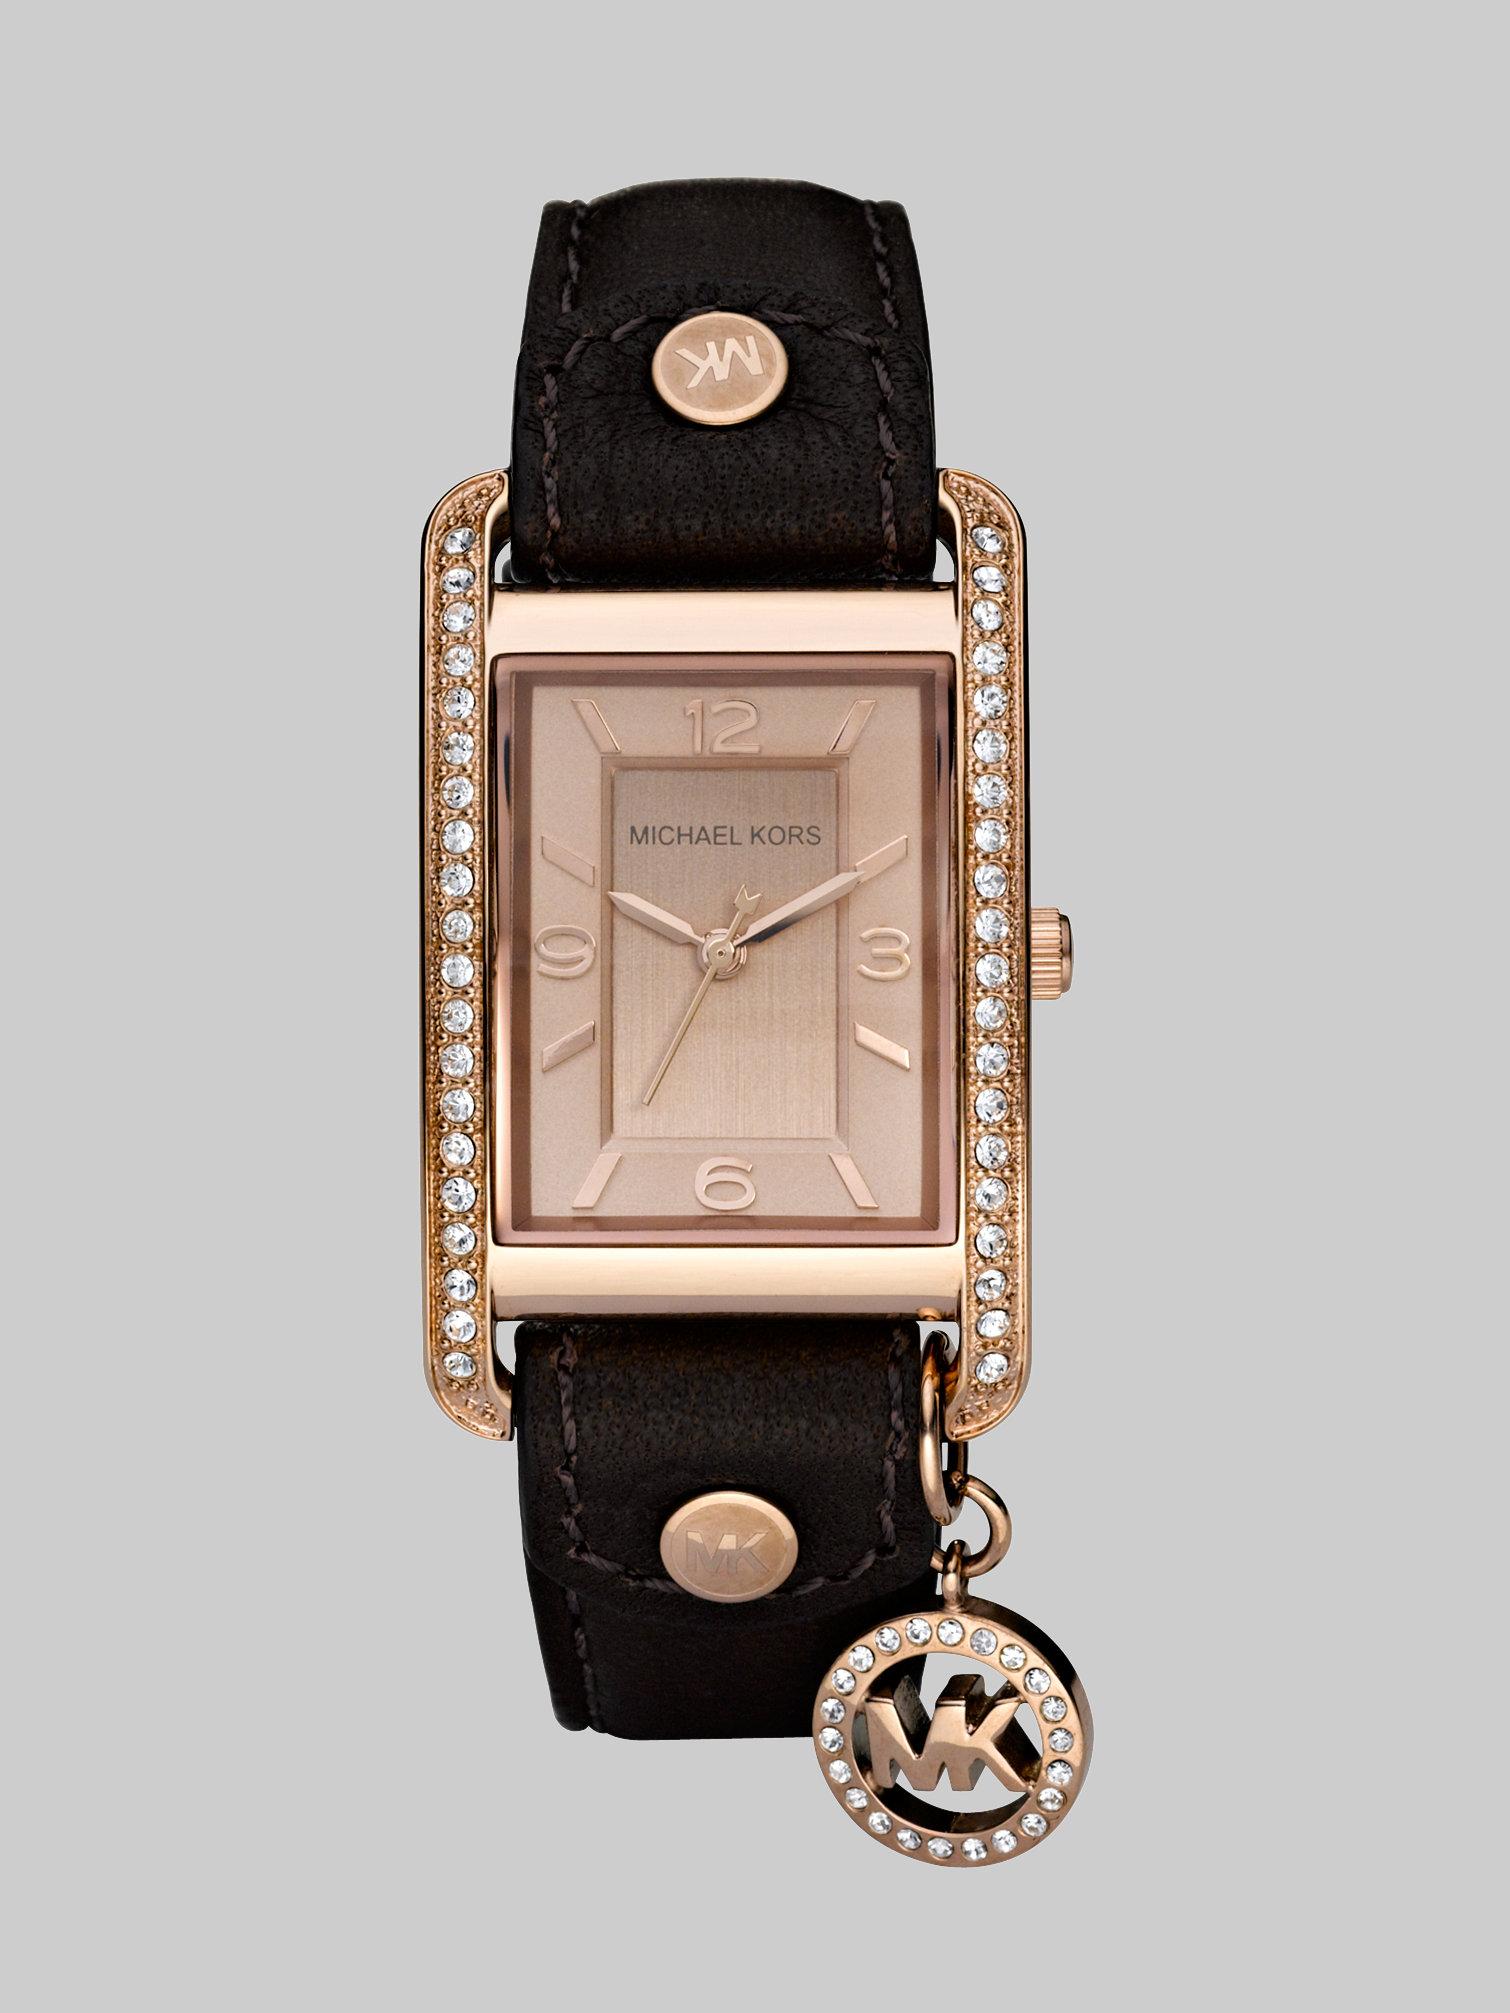 Michael kors Rectangular Leather Strap Watchchocolate in ...